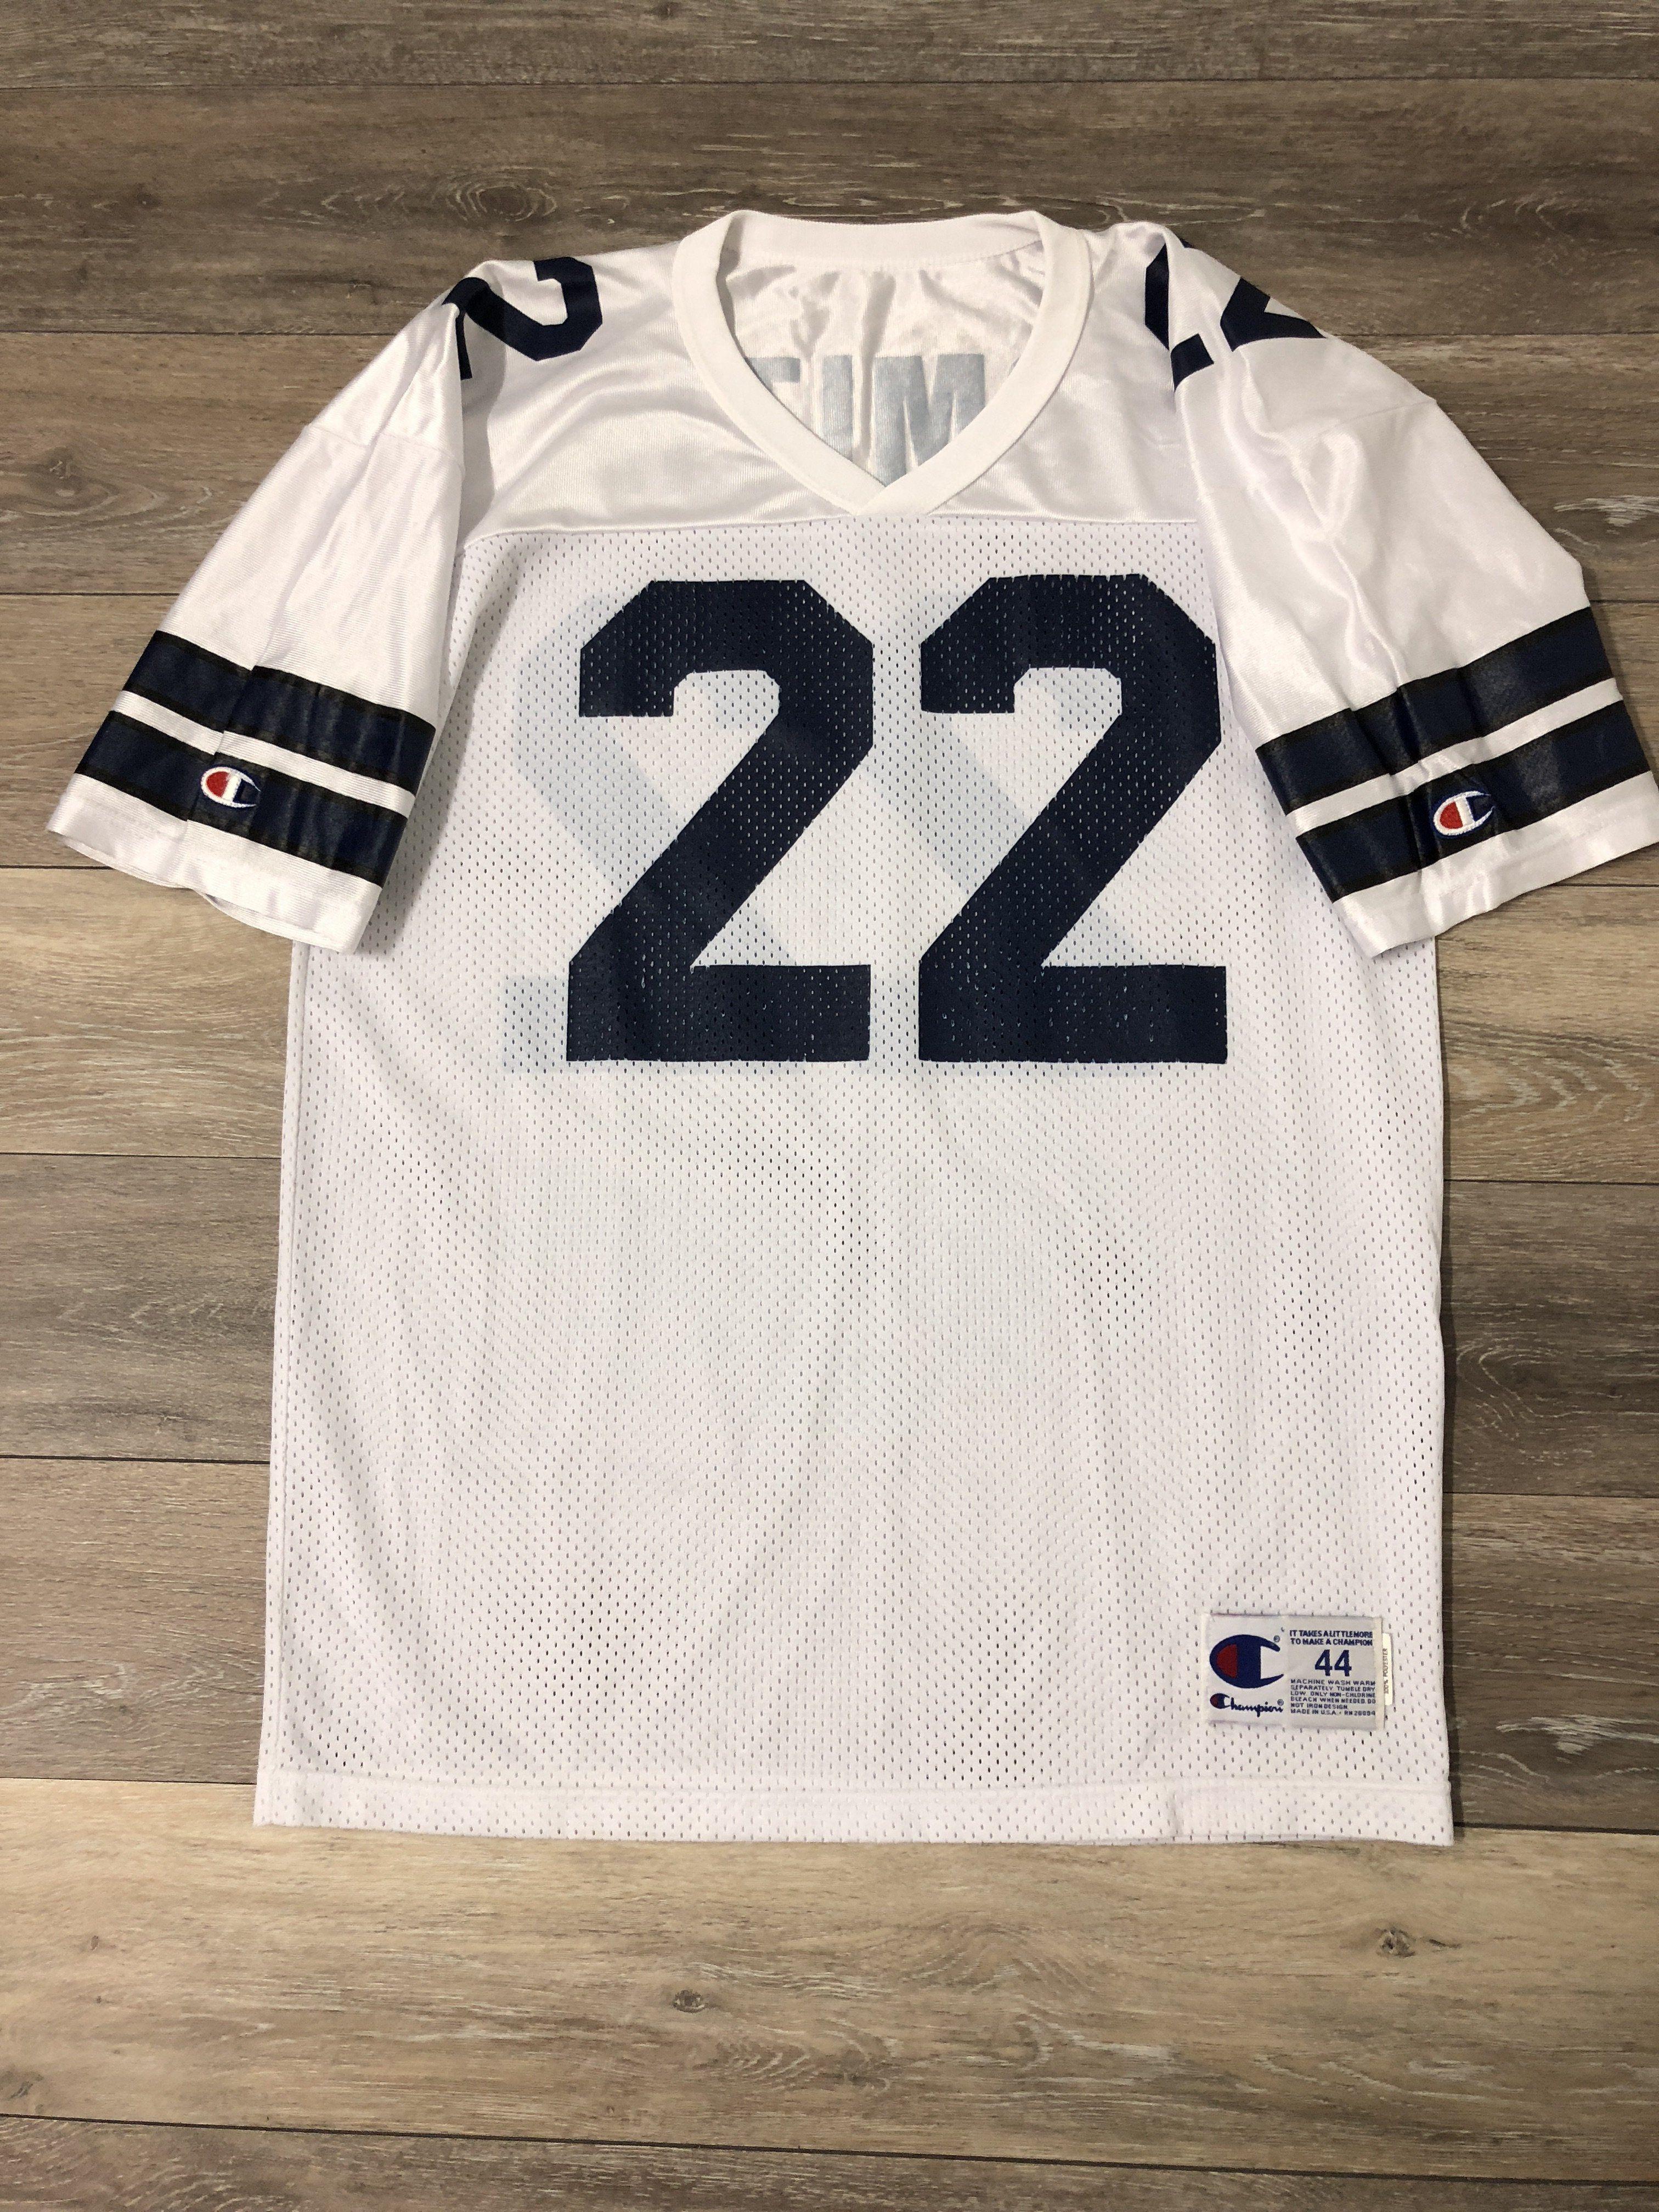 b82dc65aa Emmitt Smith Dallas Cowboys Vintage Champion NFL Jersey 44 ...